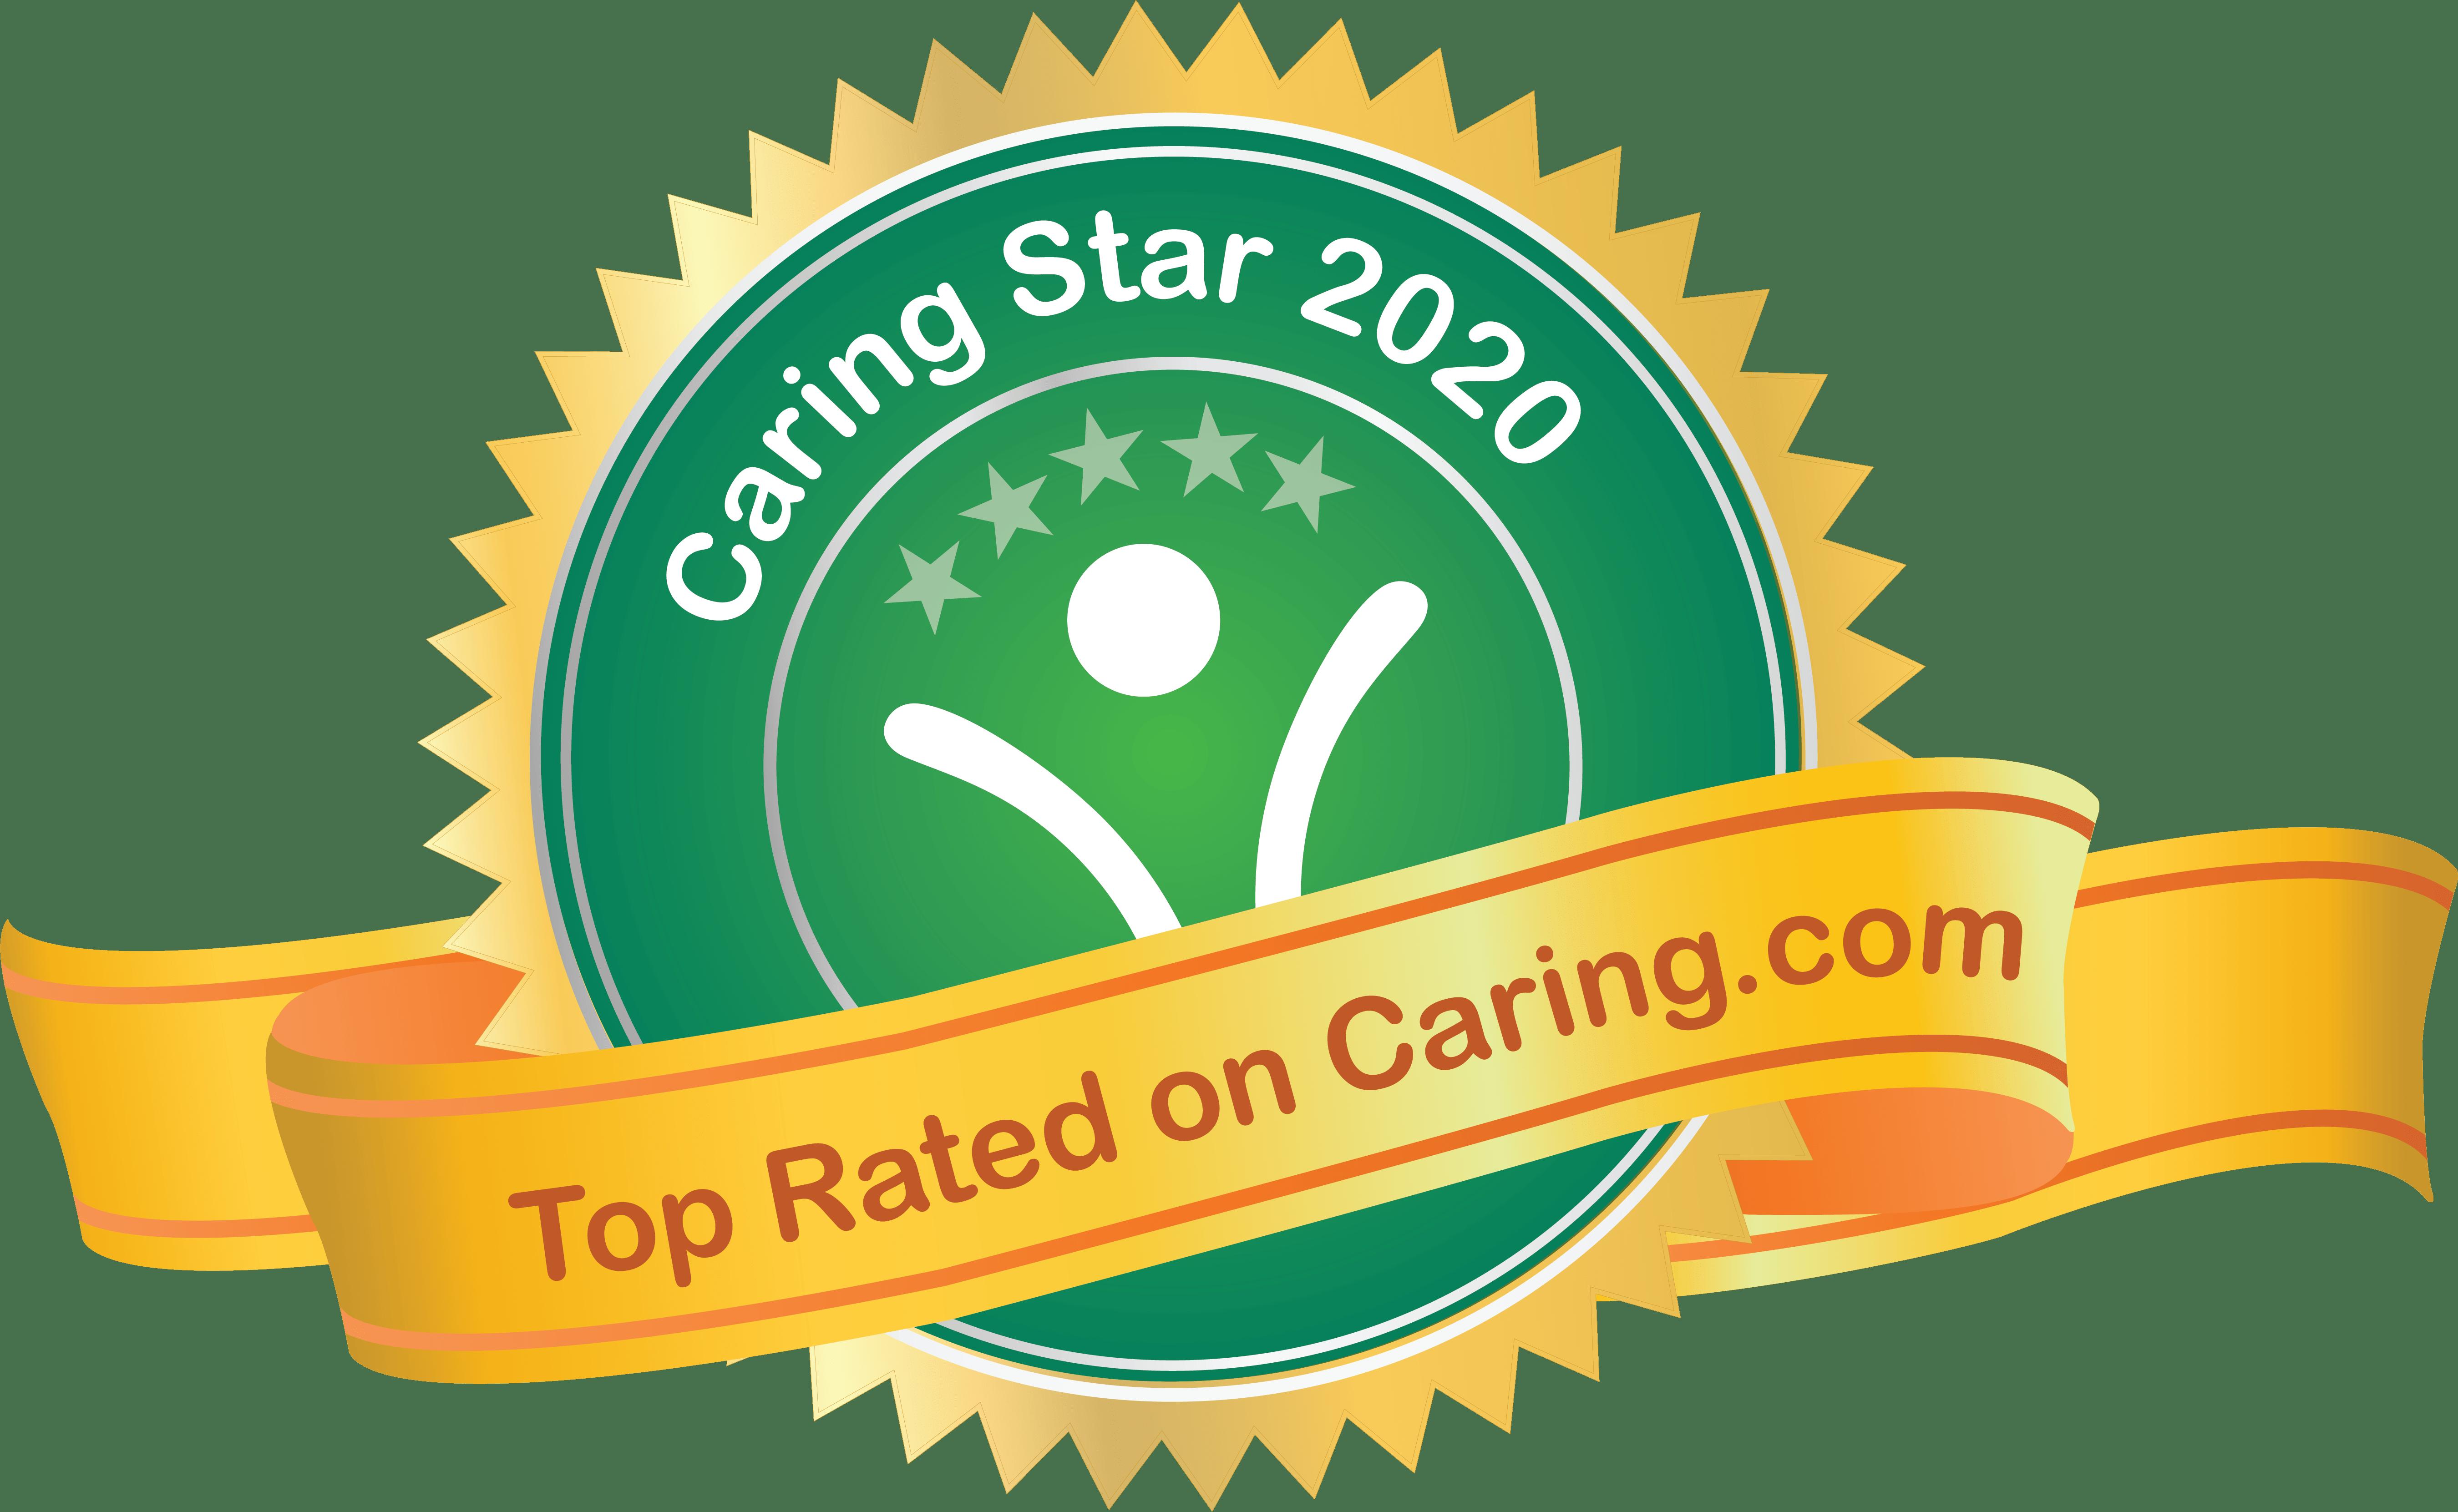 Caring Star 2020